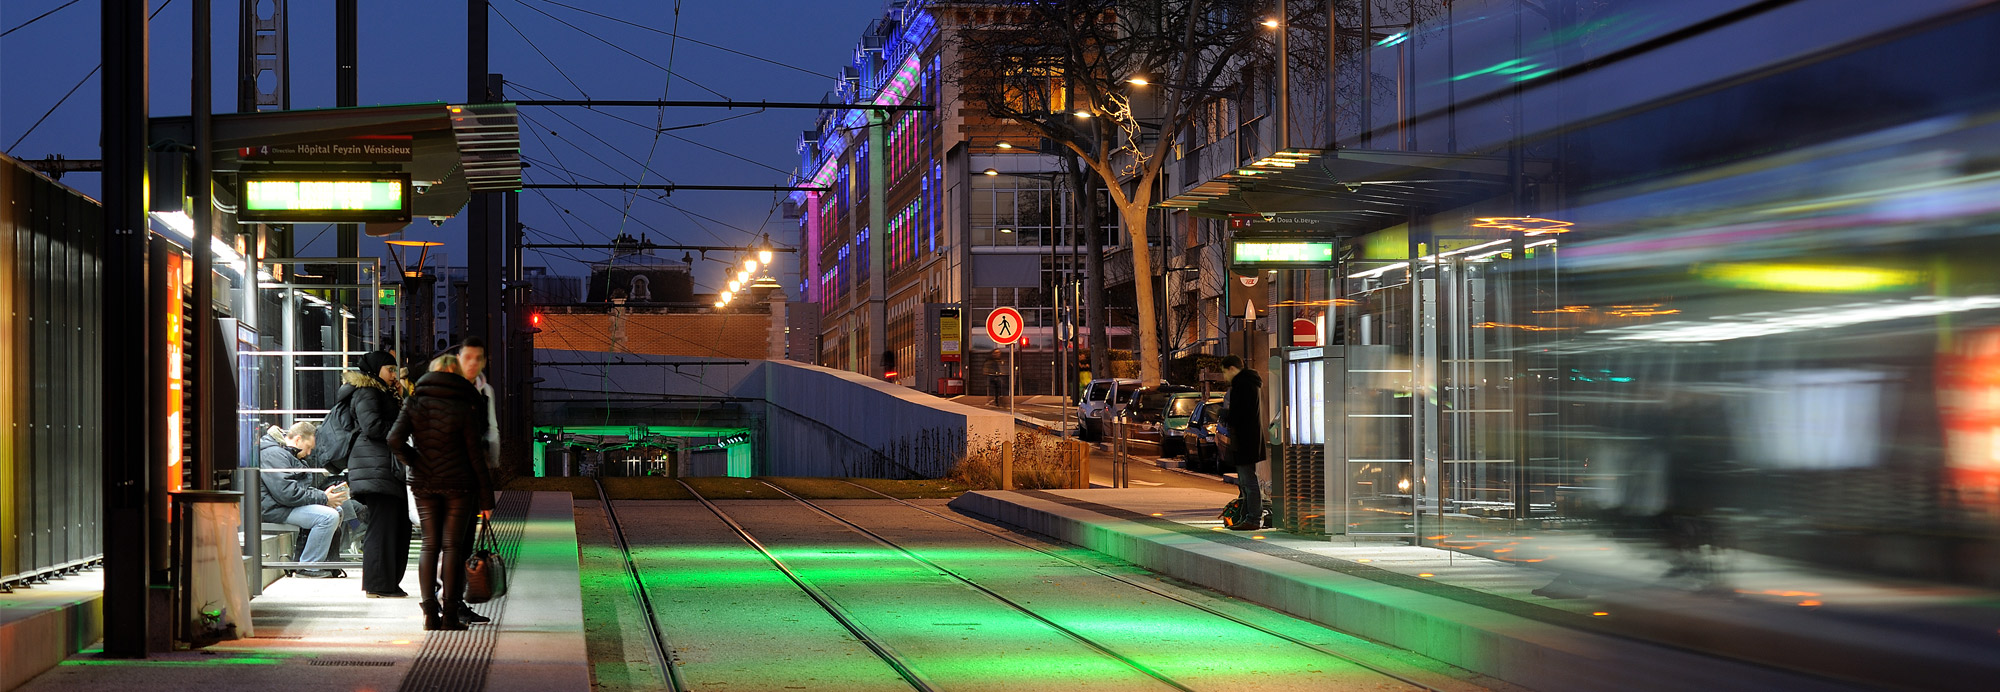 T4_Tram_Line_06